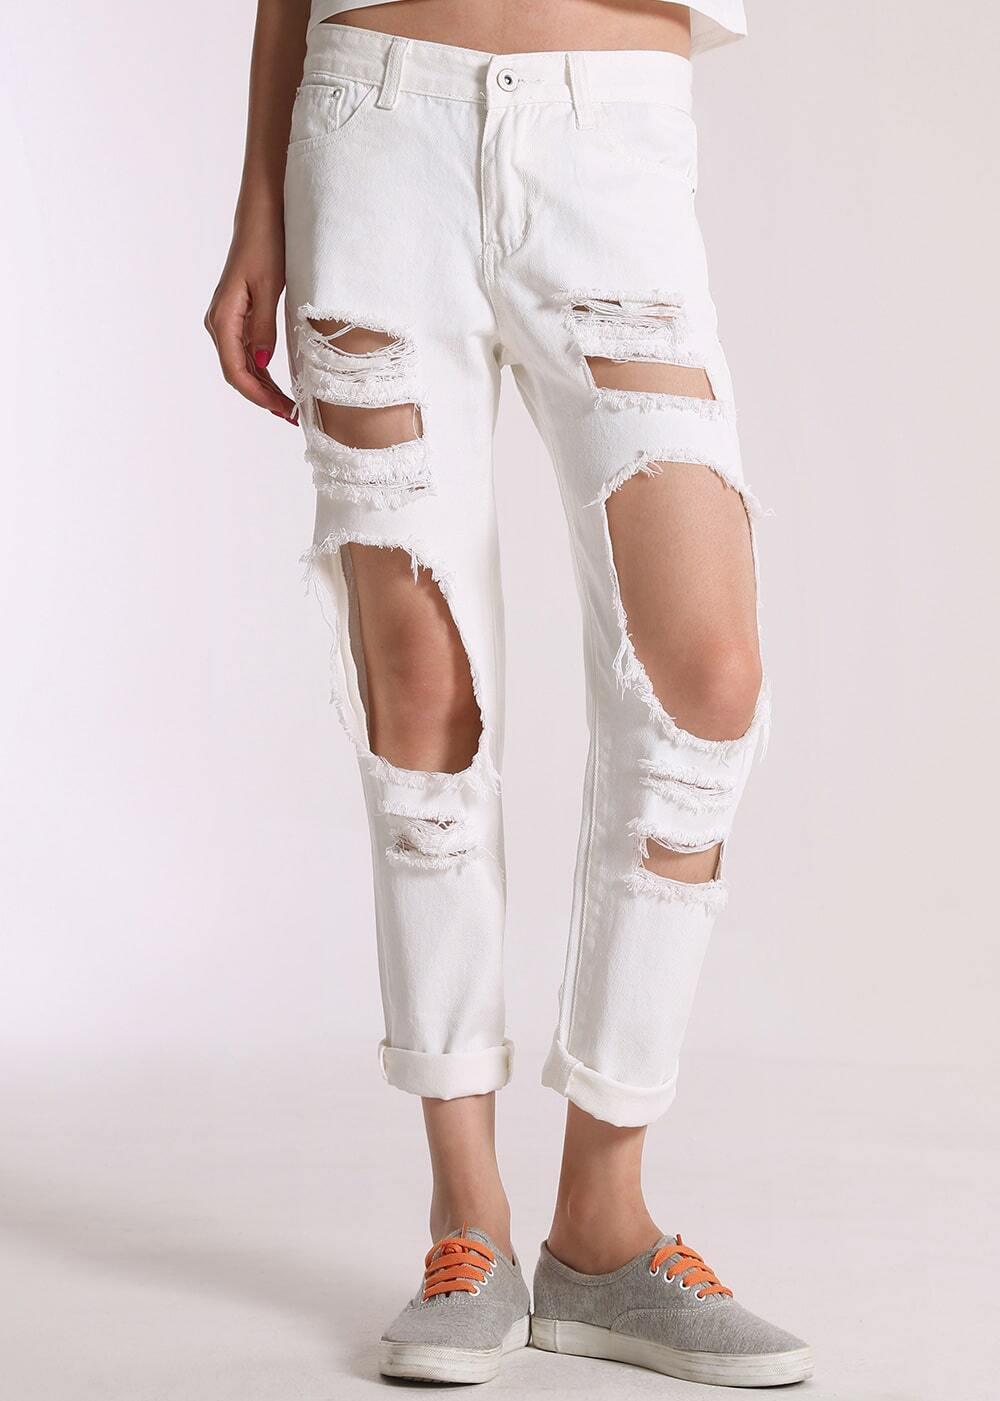 pantalon edenim d chir blanc french shein sheinside. Black Bedroom Furniture Sets. Home Design Ideas